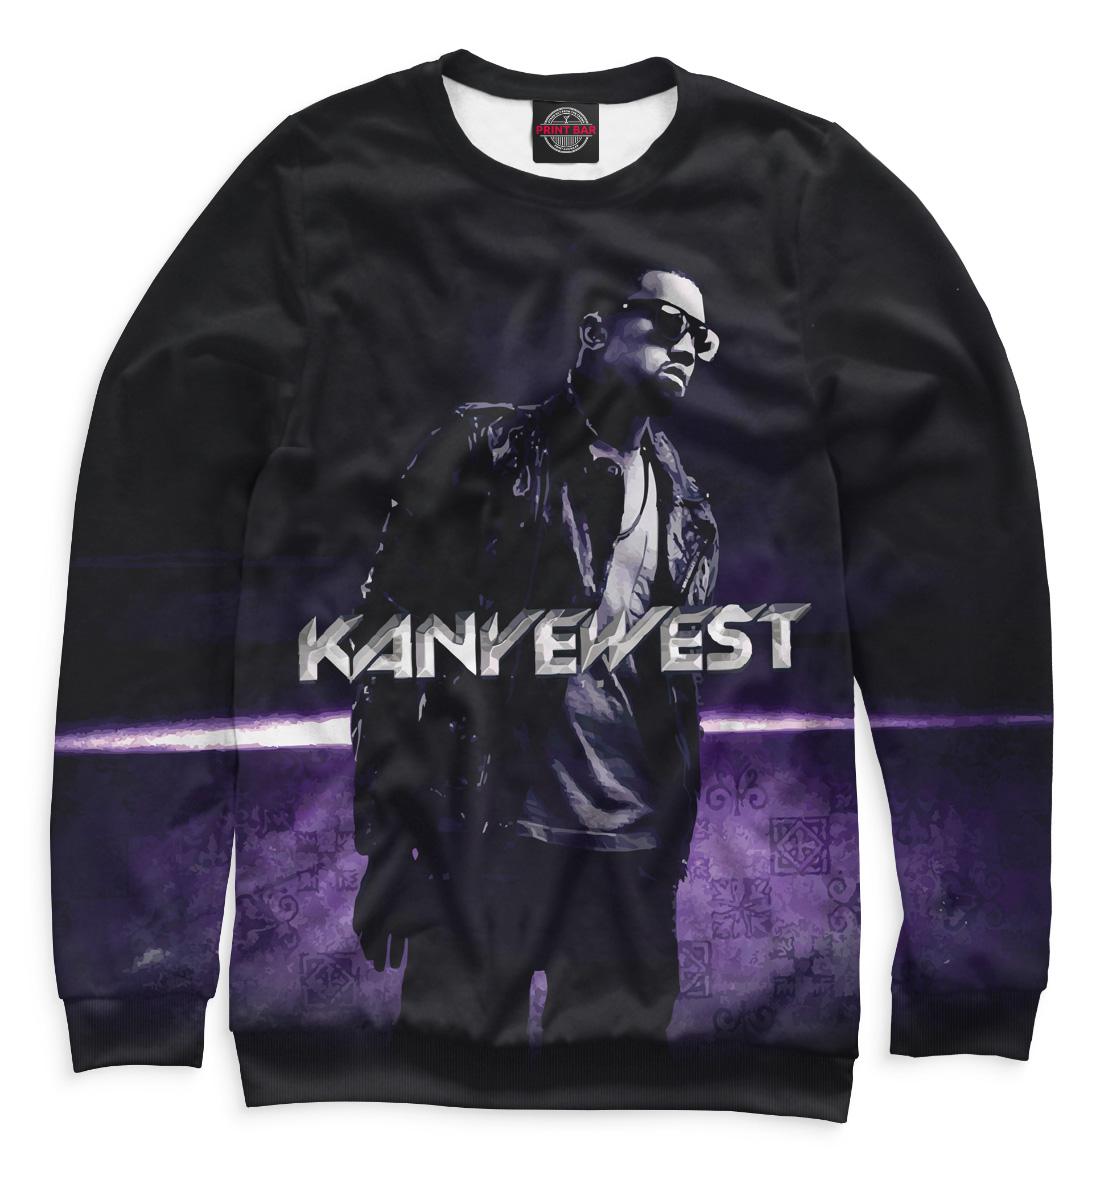 Купить Kanye West, Printbar, Свитшоты, KAW-291290-swi-2